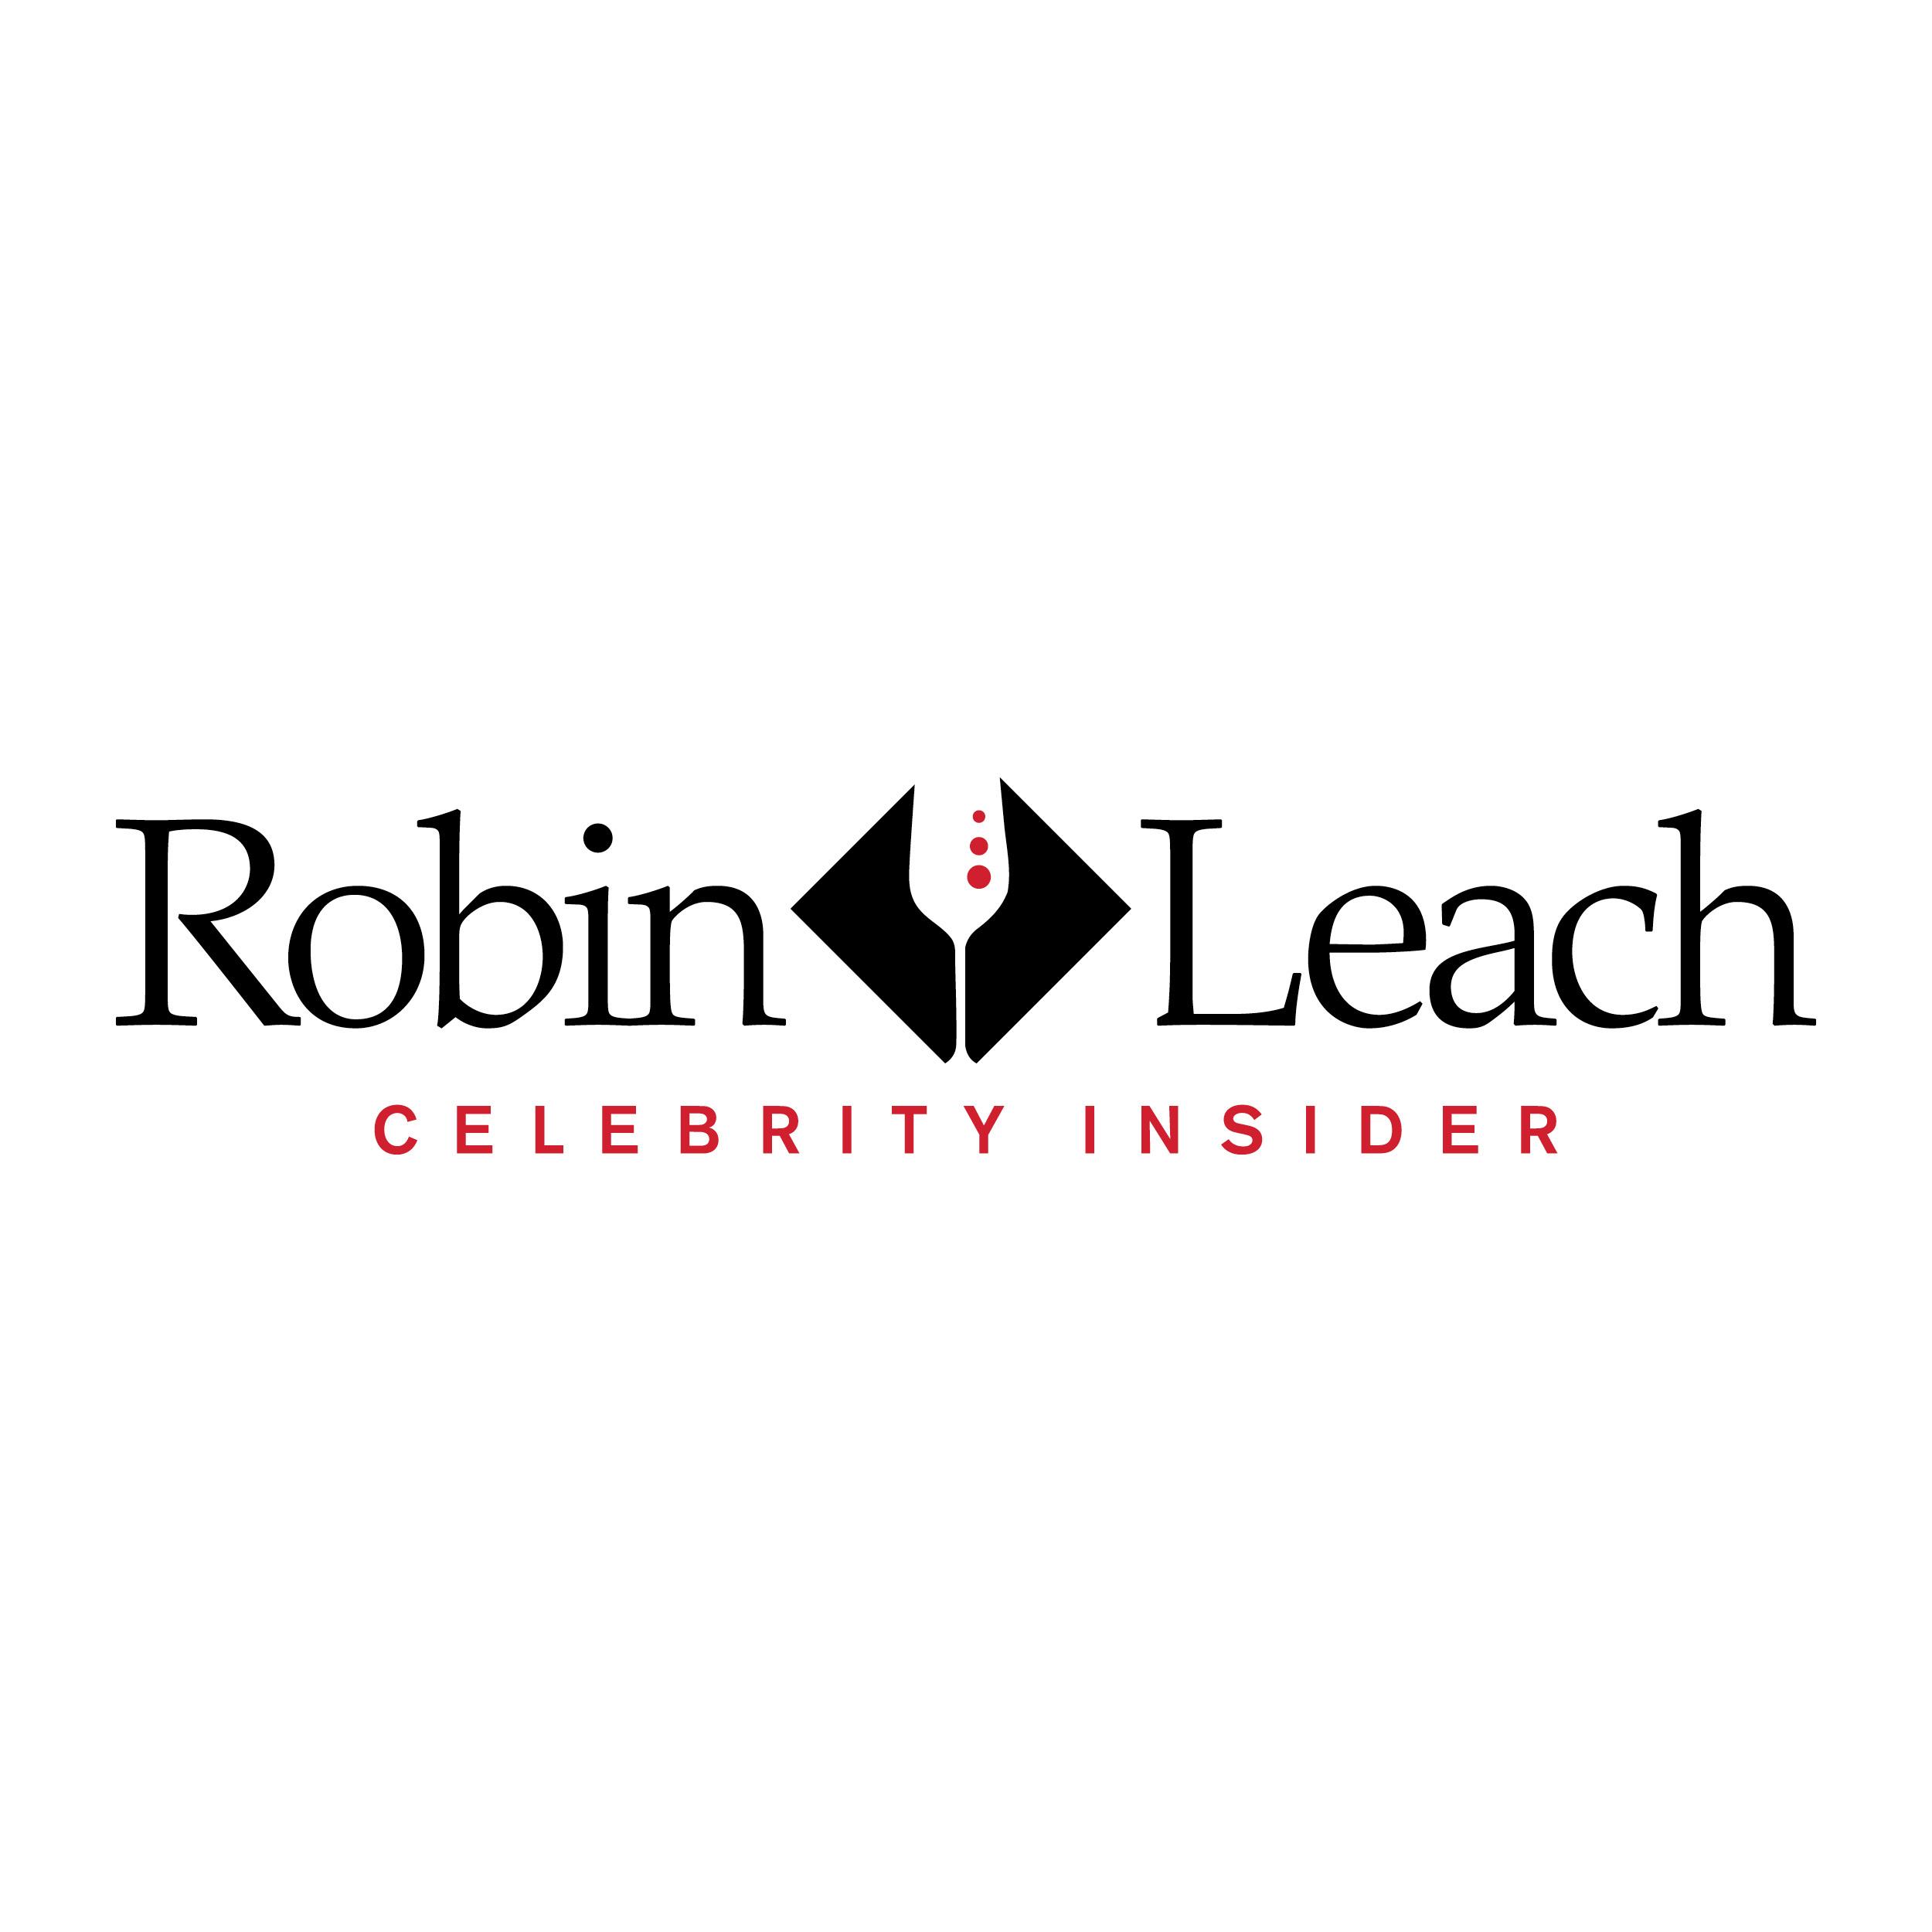 Robin Leach, Celebrity Insider